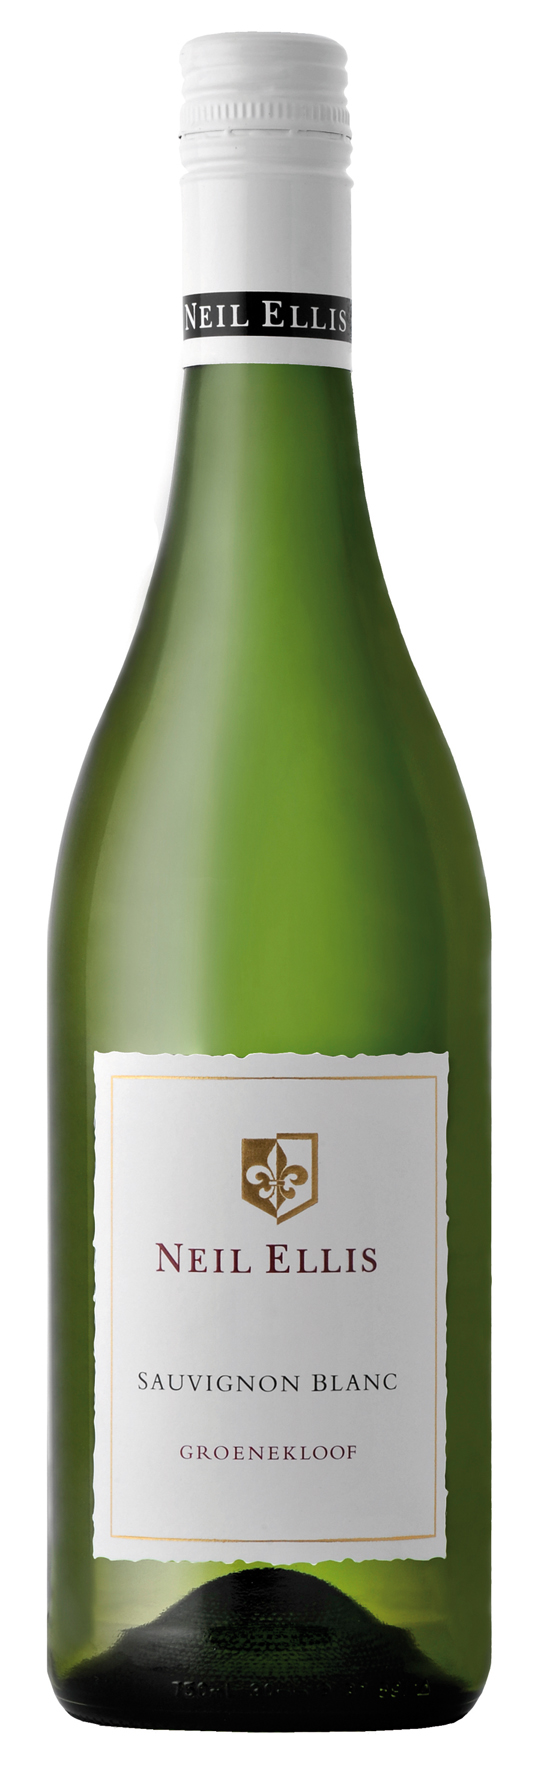 Sauvignon Blanc - Groenekloof - Neil Ellis 2015 Stellenbosch